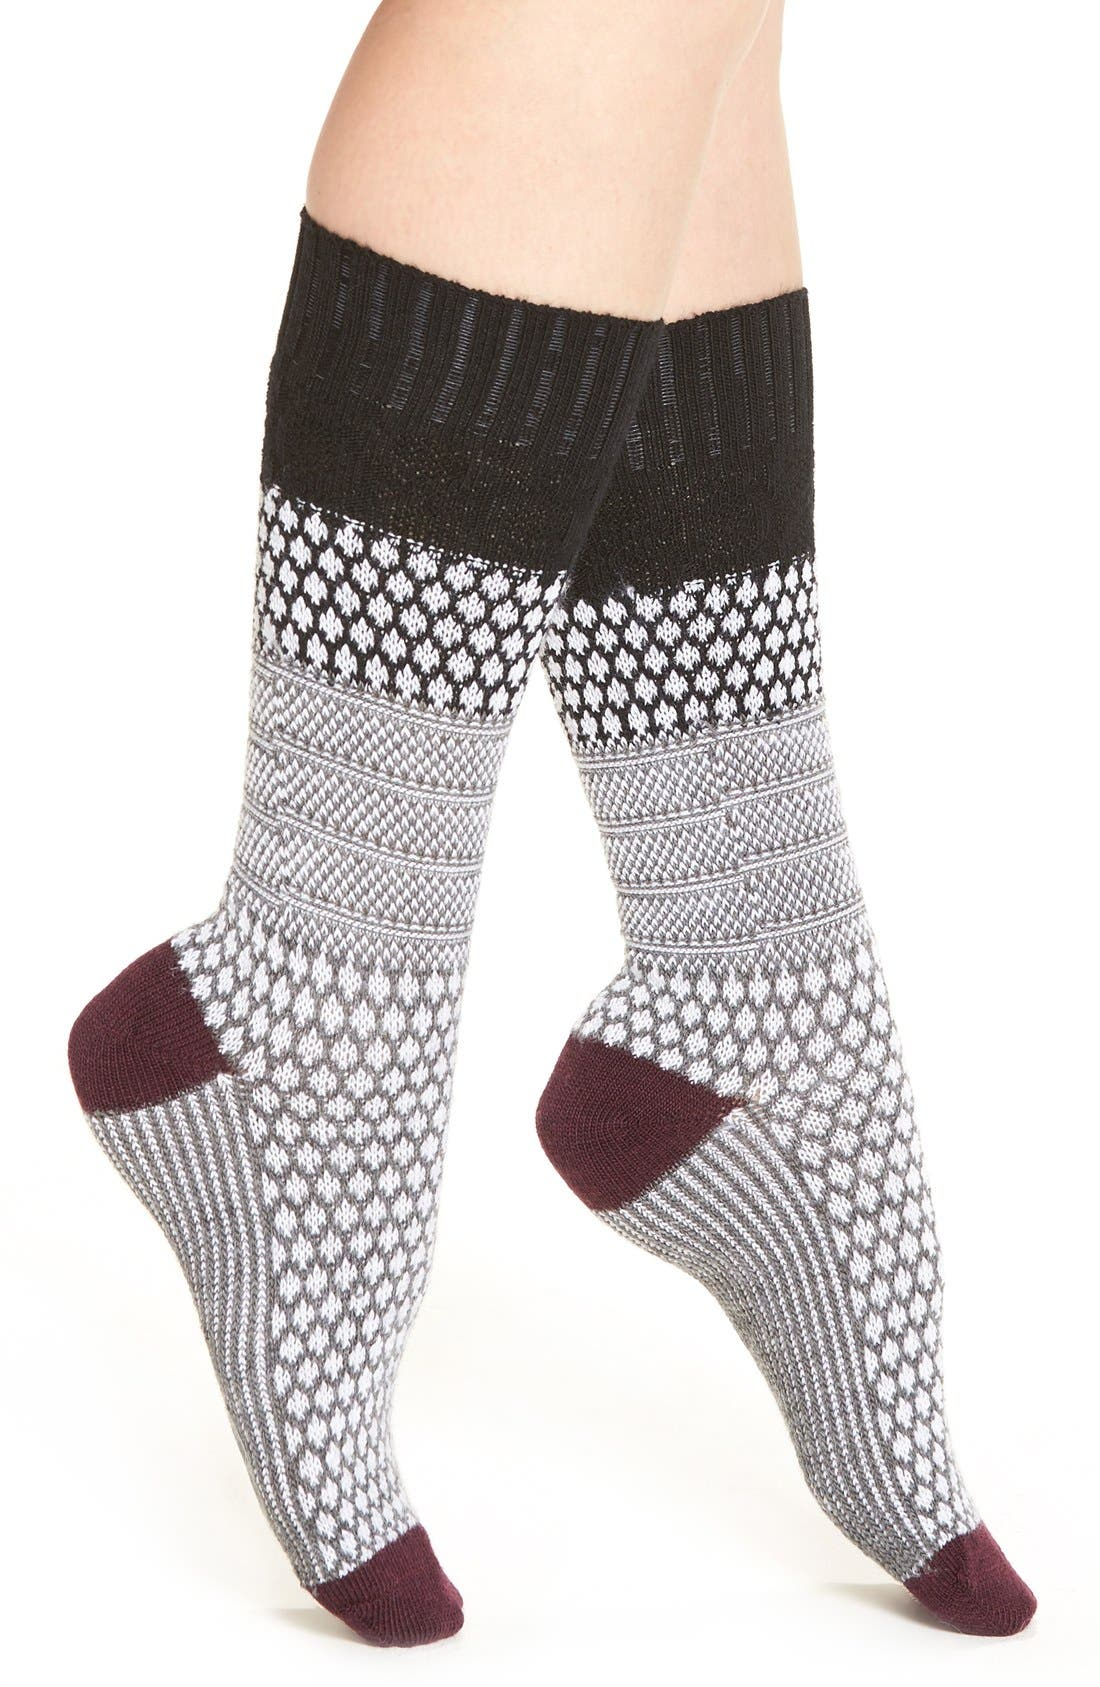 Main Image - Smartwool Popcorn Cable Crew Socks